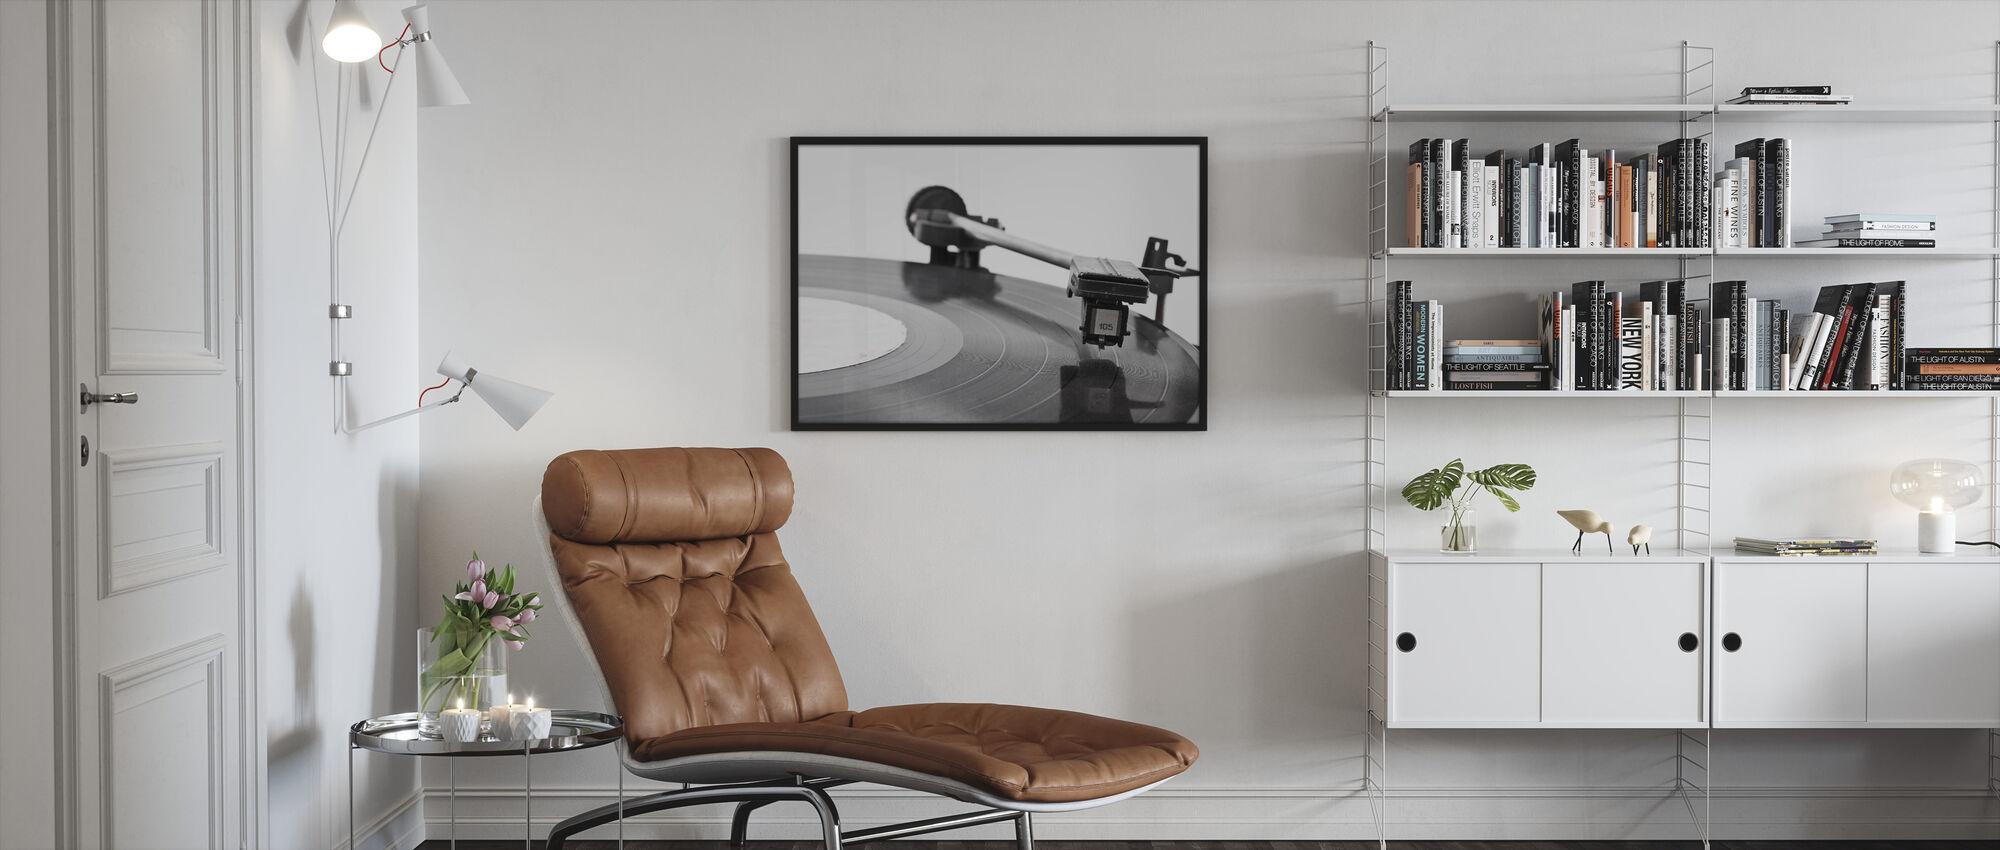 Old Vinyl Player - Framed print - Living Room